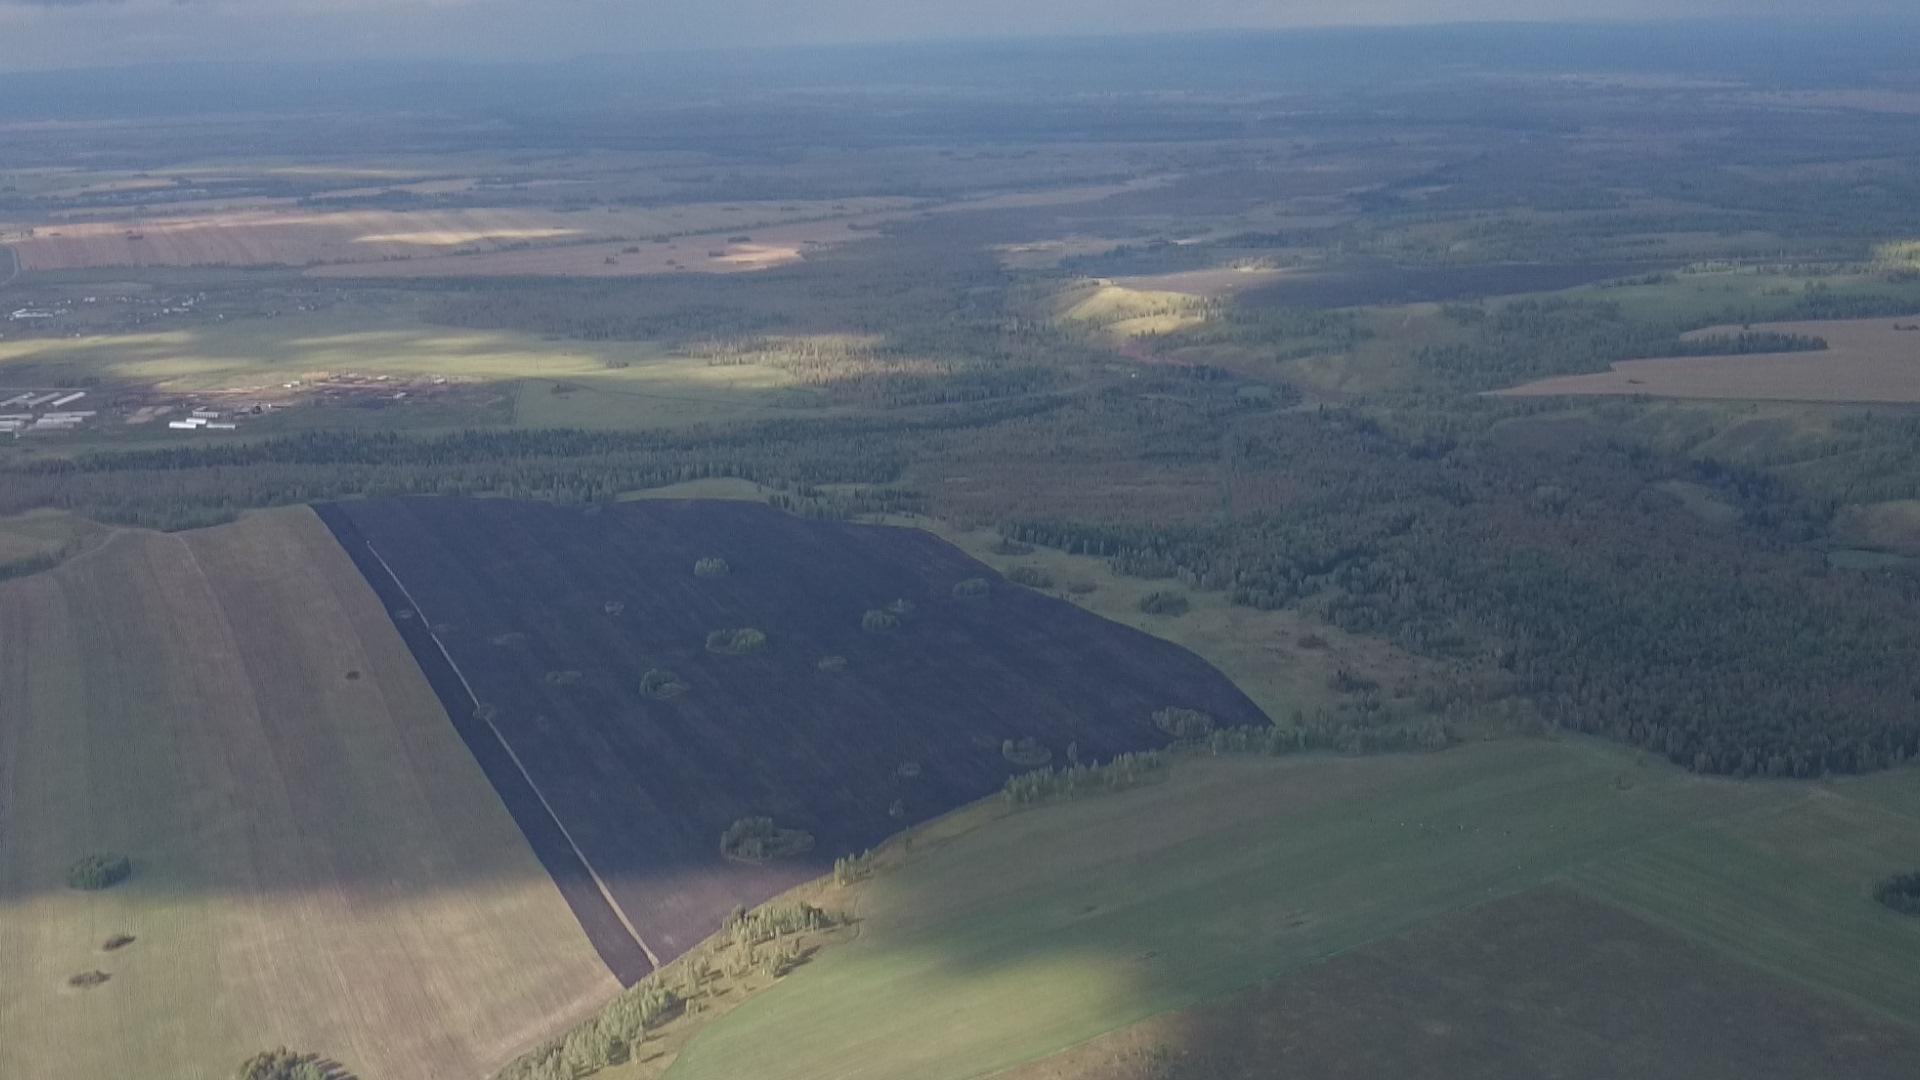 Красноярск Аэродром ДОСААФ Манский Пейзаж снятый с парашюта Пашня. 6.09.2015 года